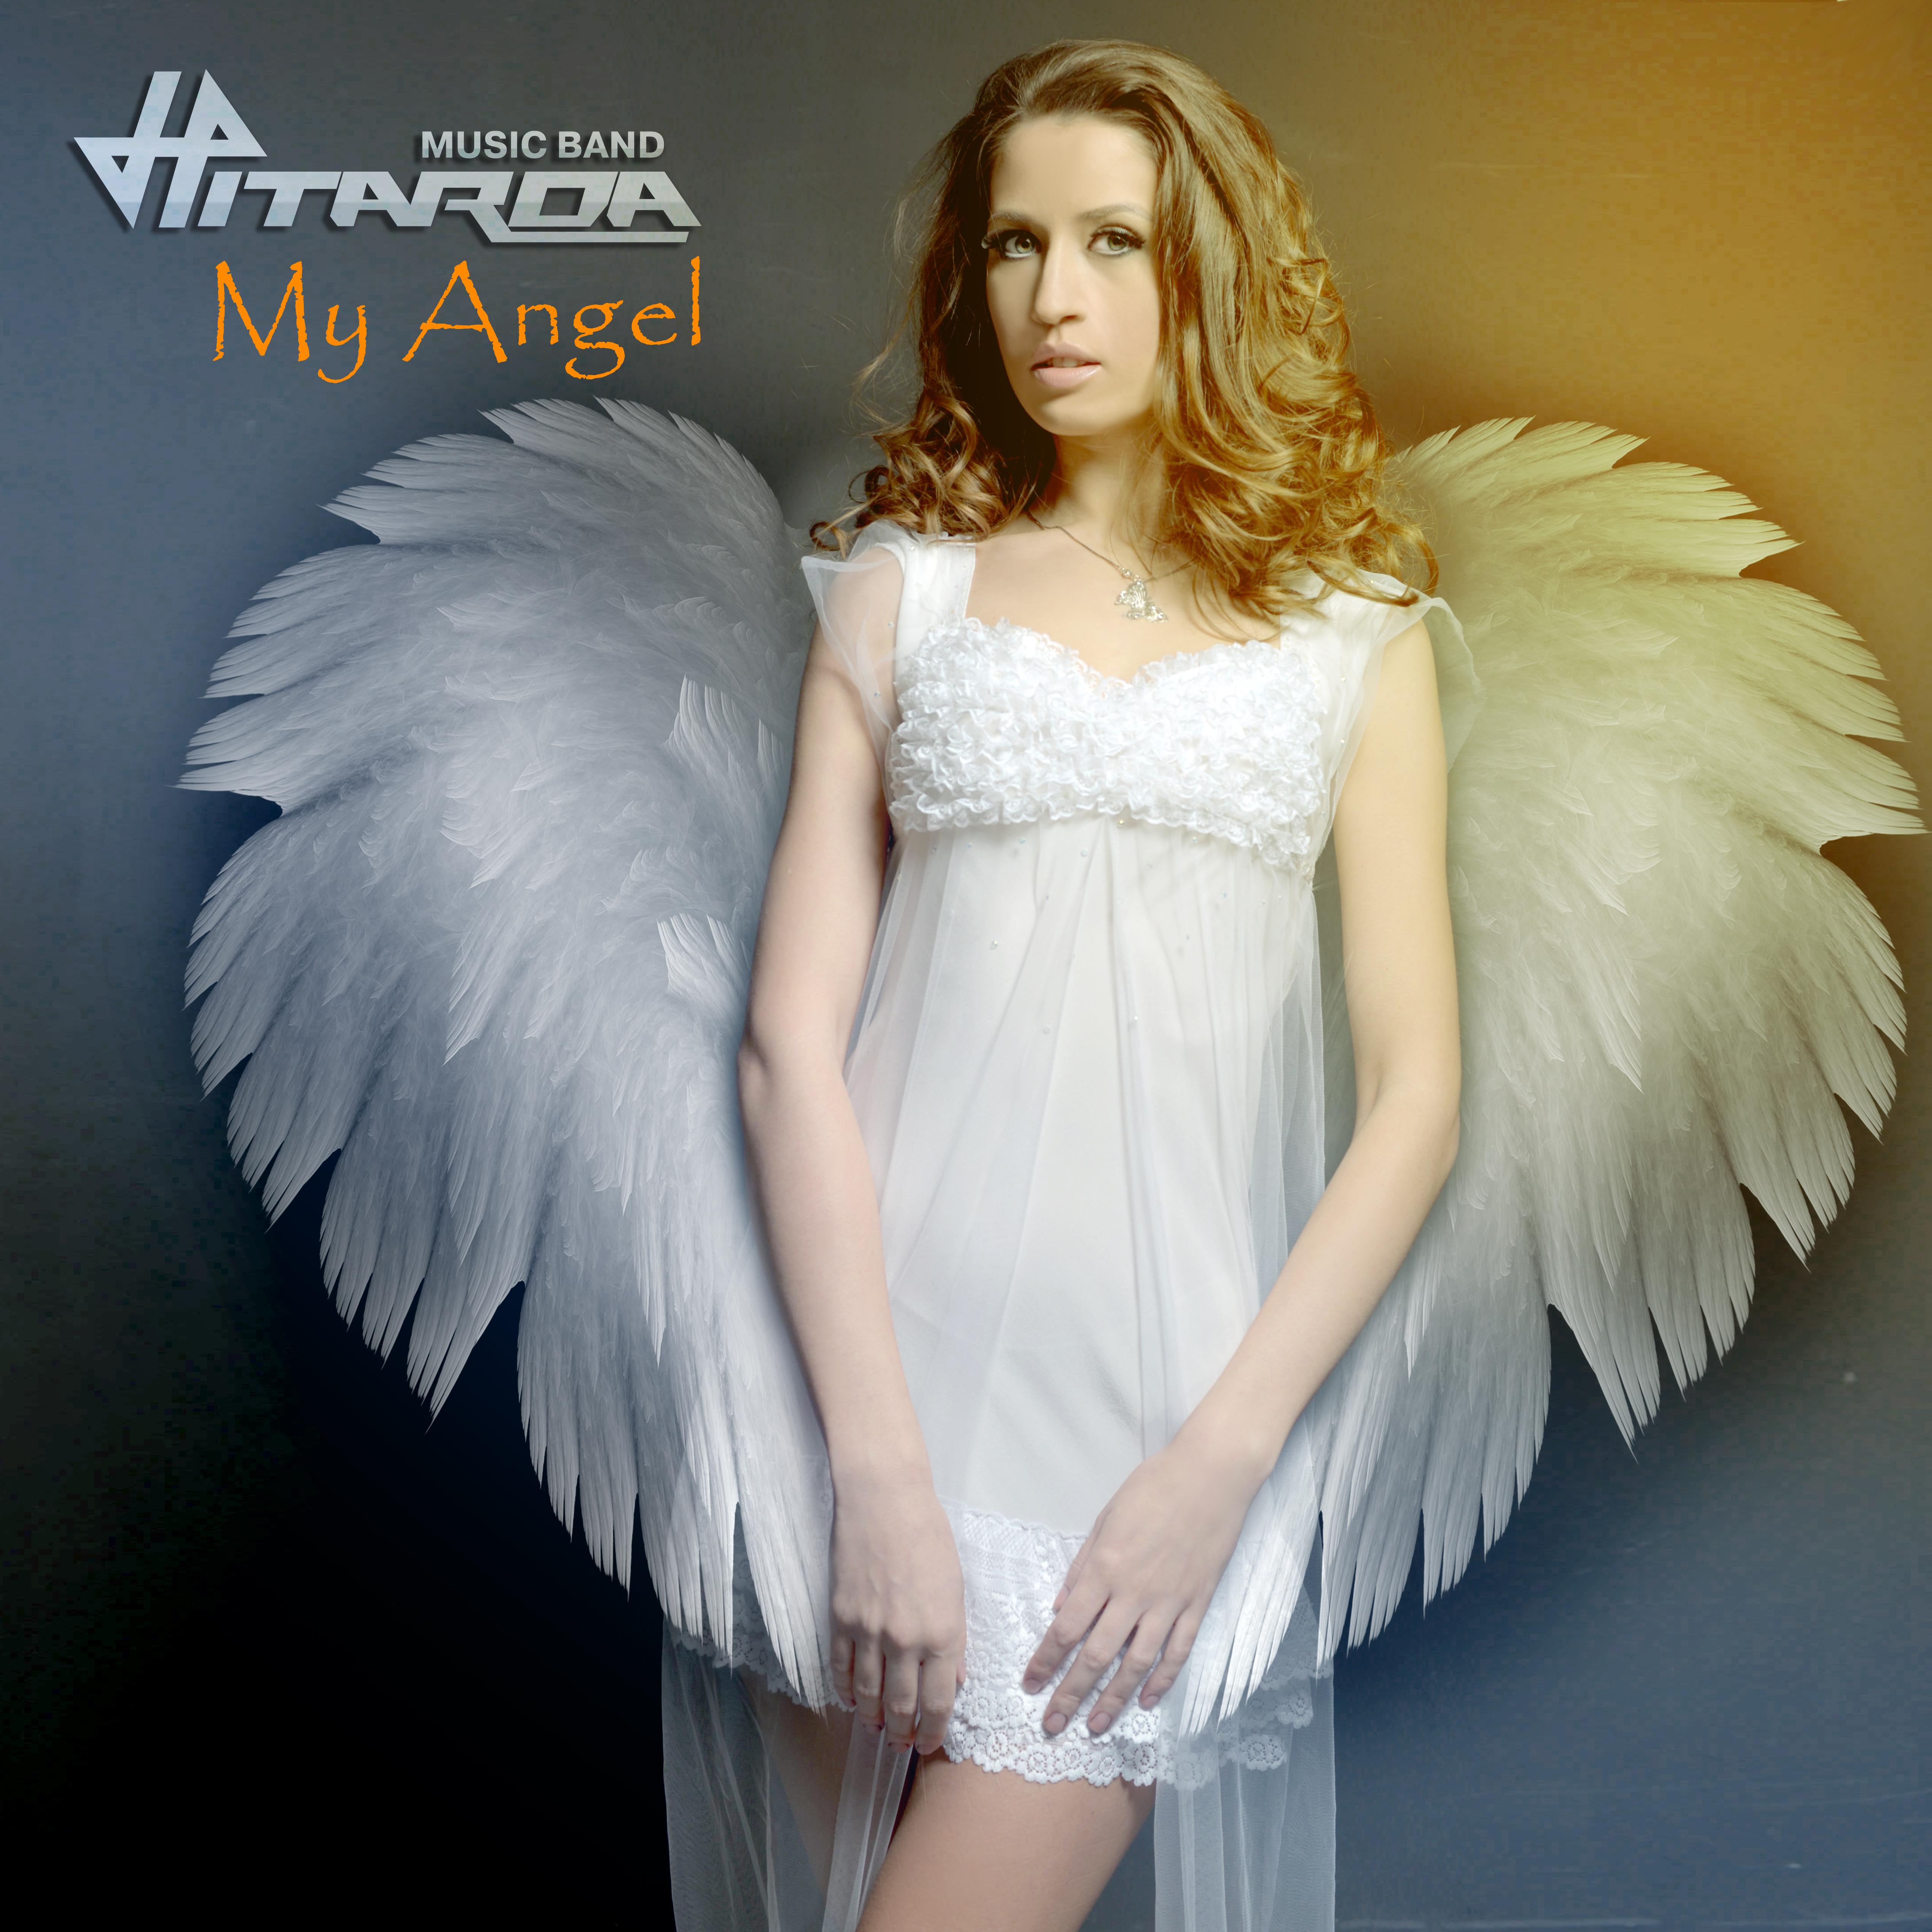 Hitarda – My Angel